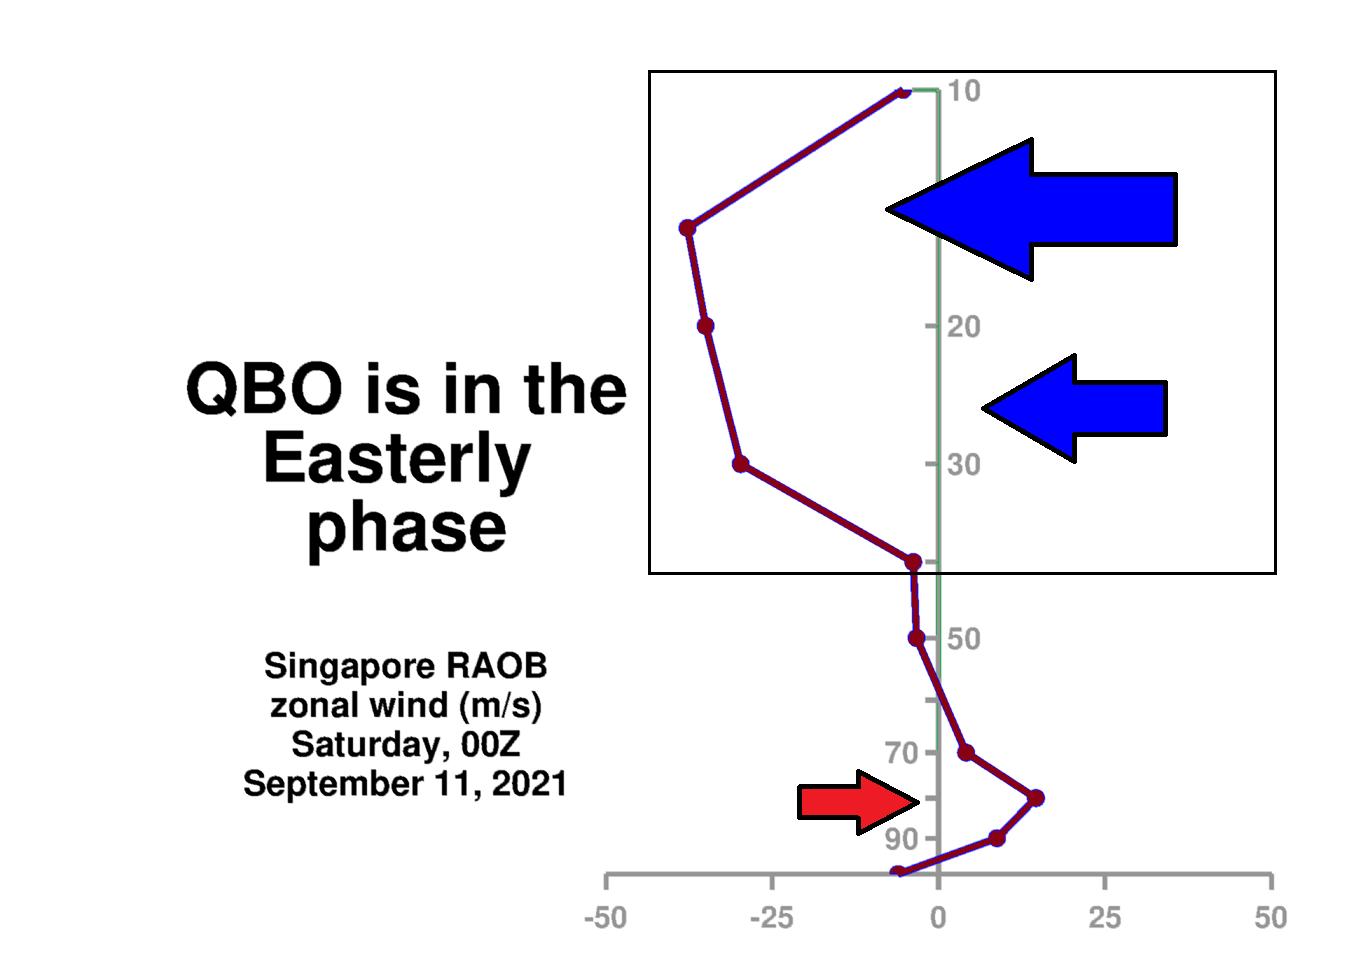 Quasi-Biennial-Oscillation-easterly-phase-wind-profile